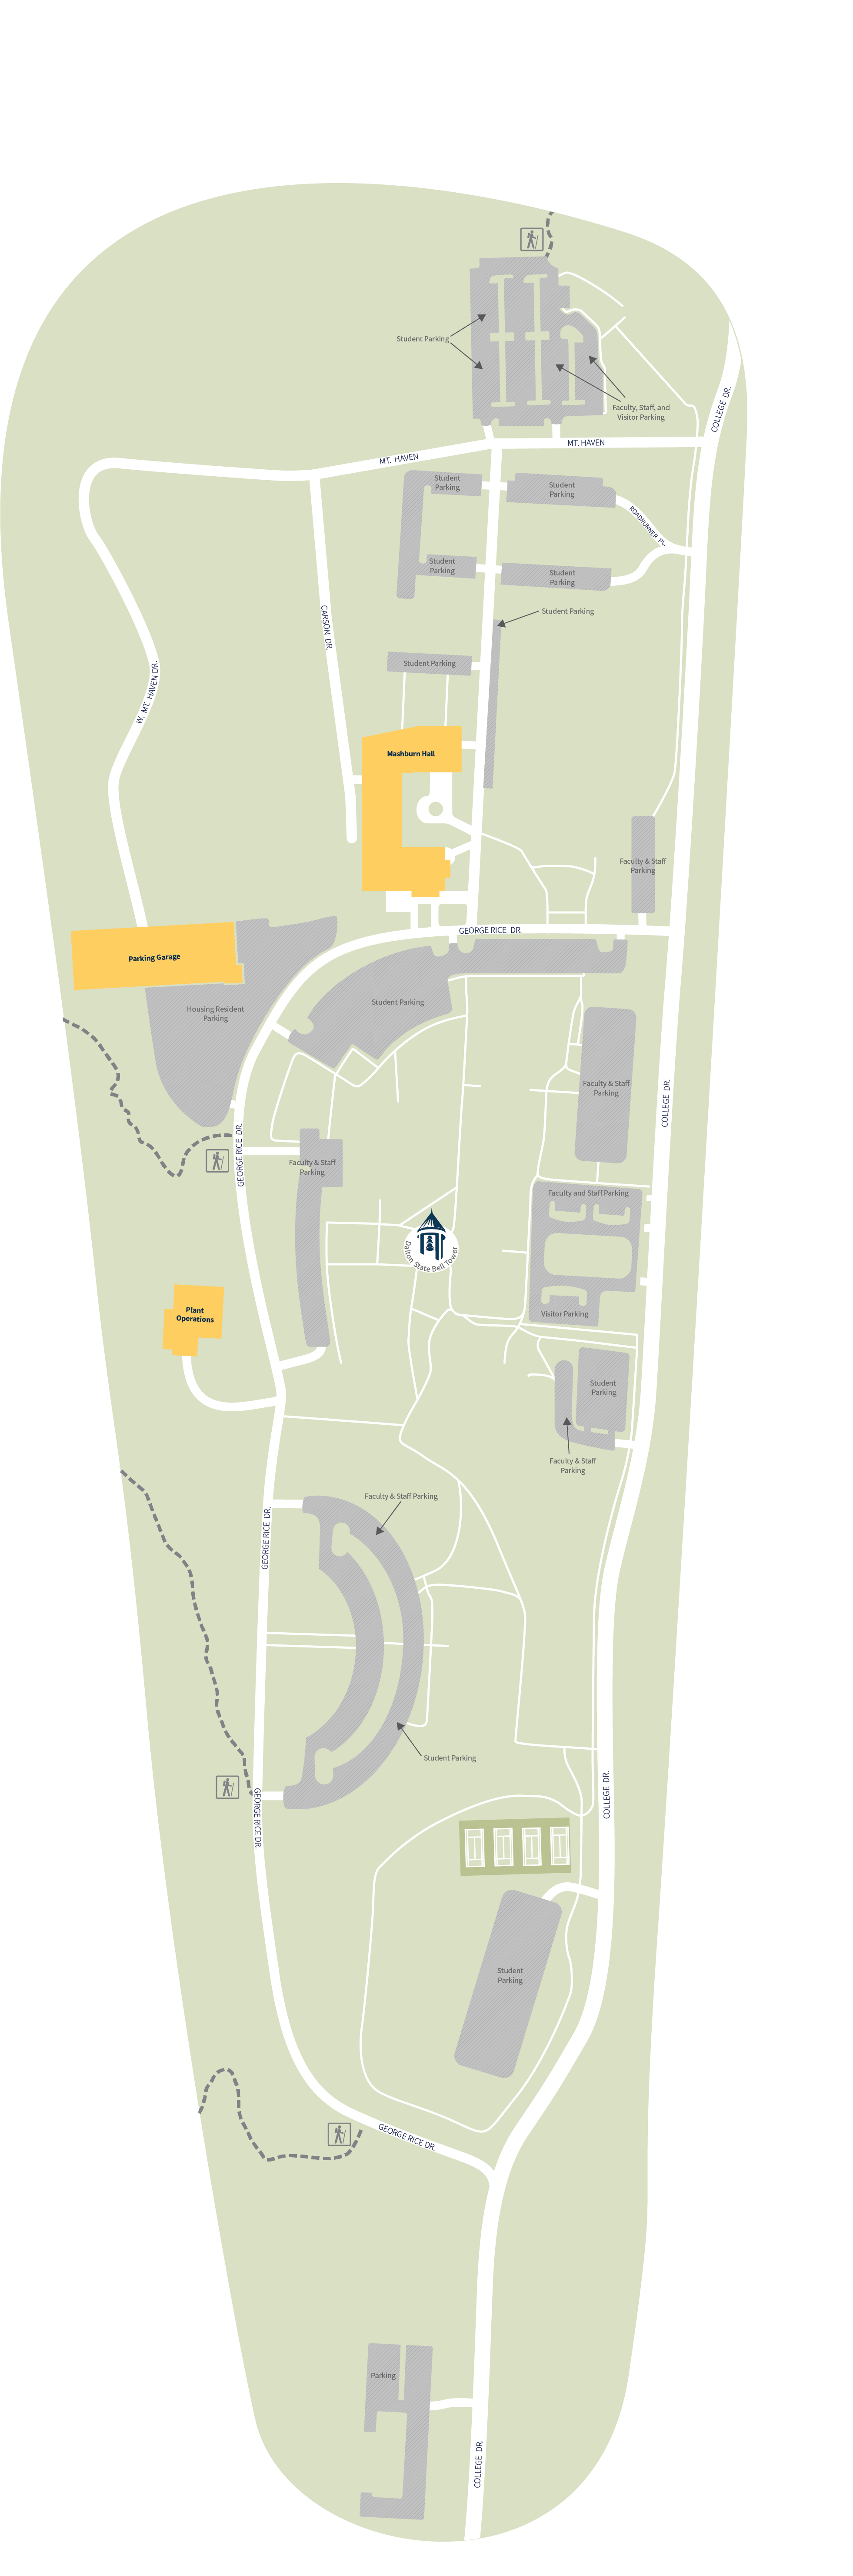 Polk State College Campus Map.Campus Map Dalton State College